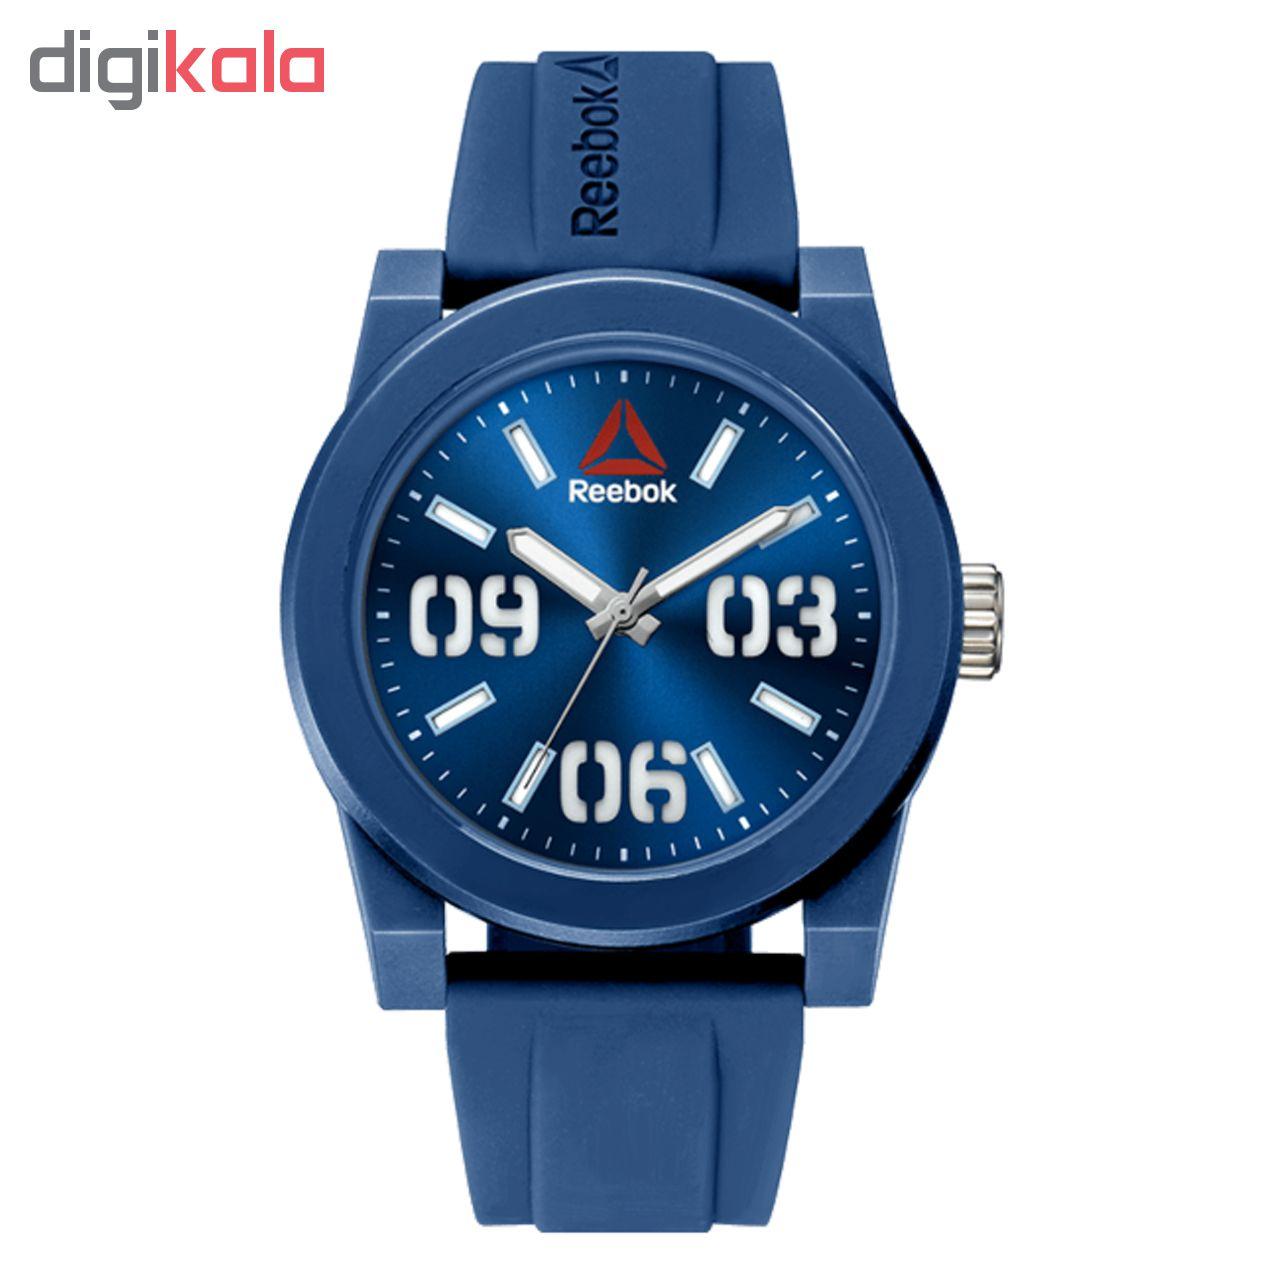 خرید ساعت مچی عقربه ای مردانه ریباک مدل RD-HOO-G2-PNIN-NW